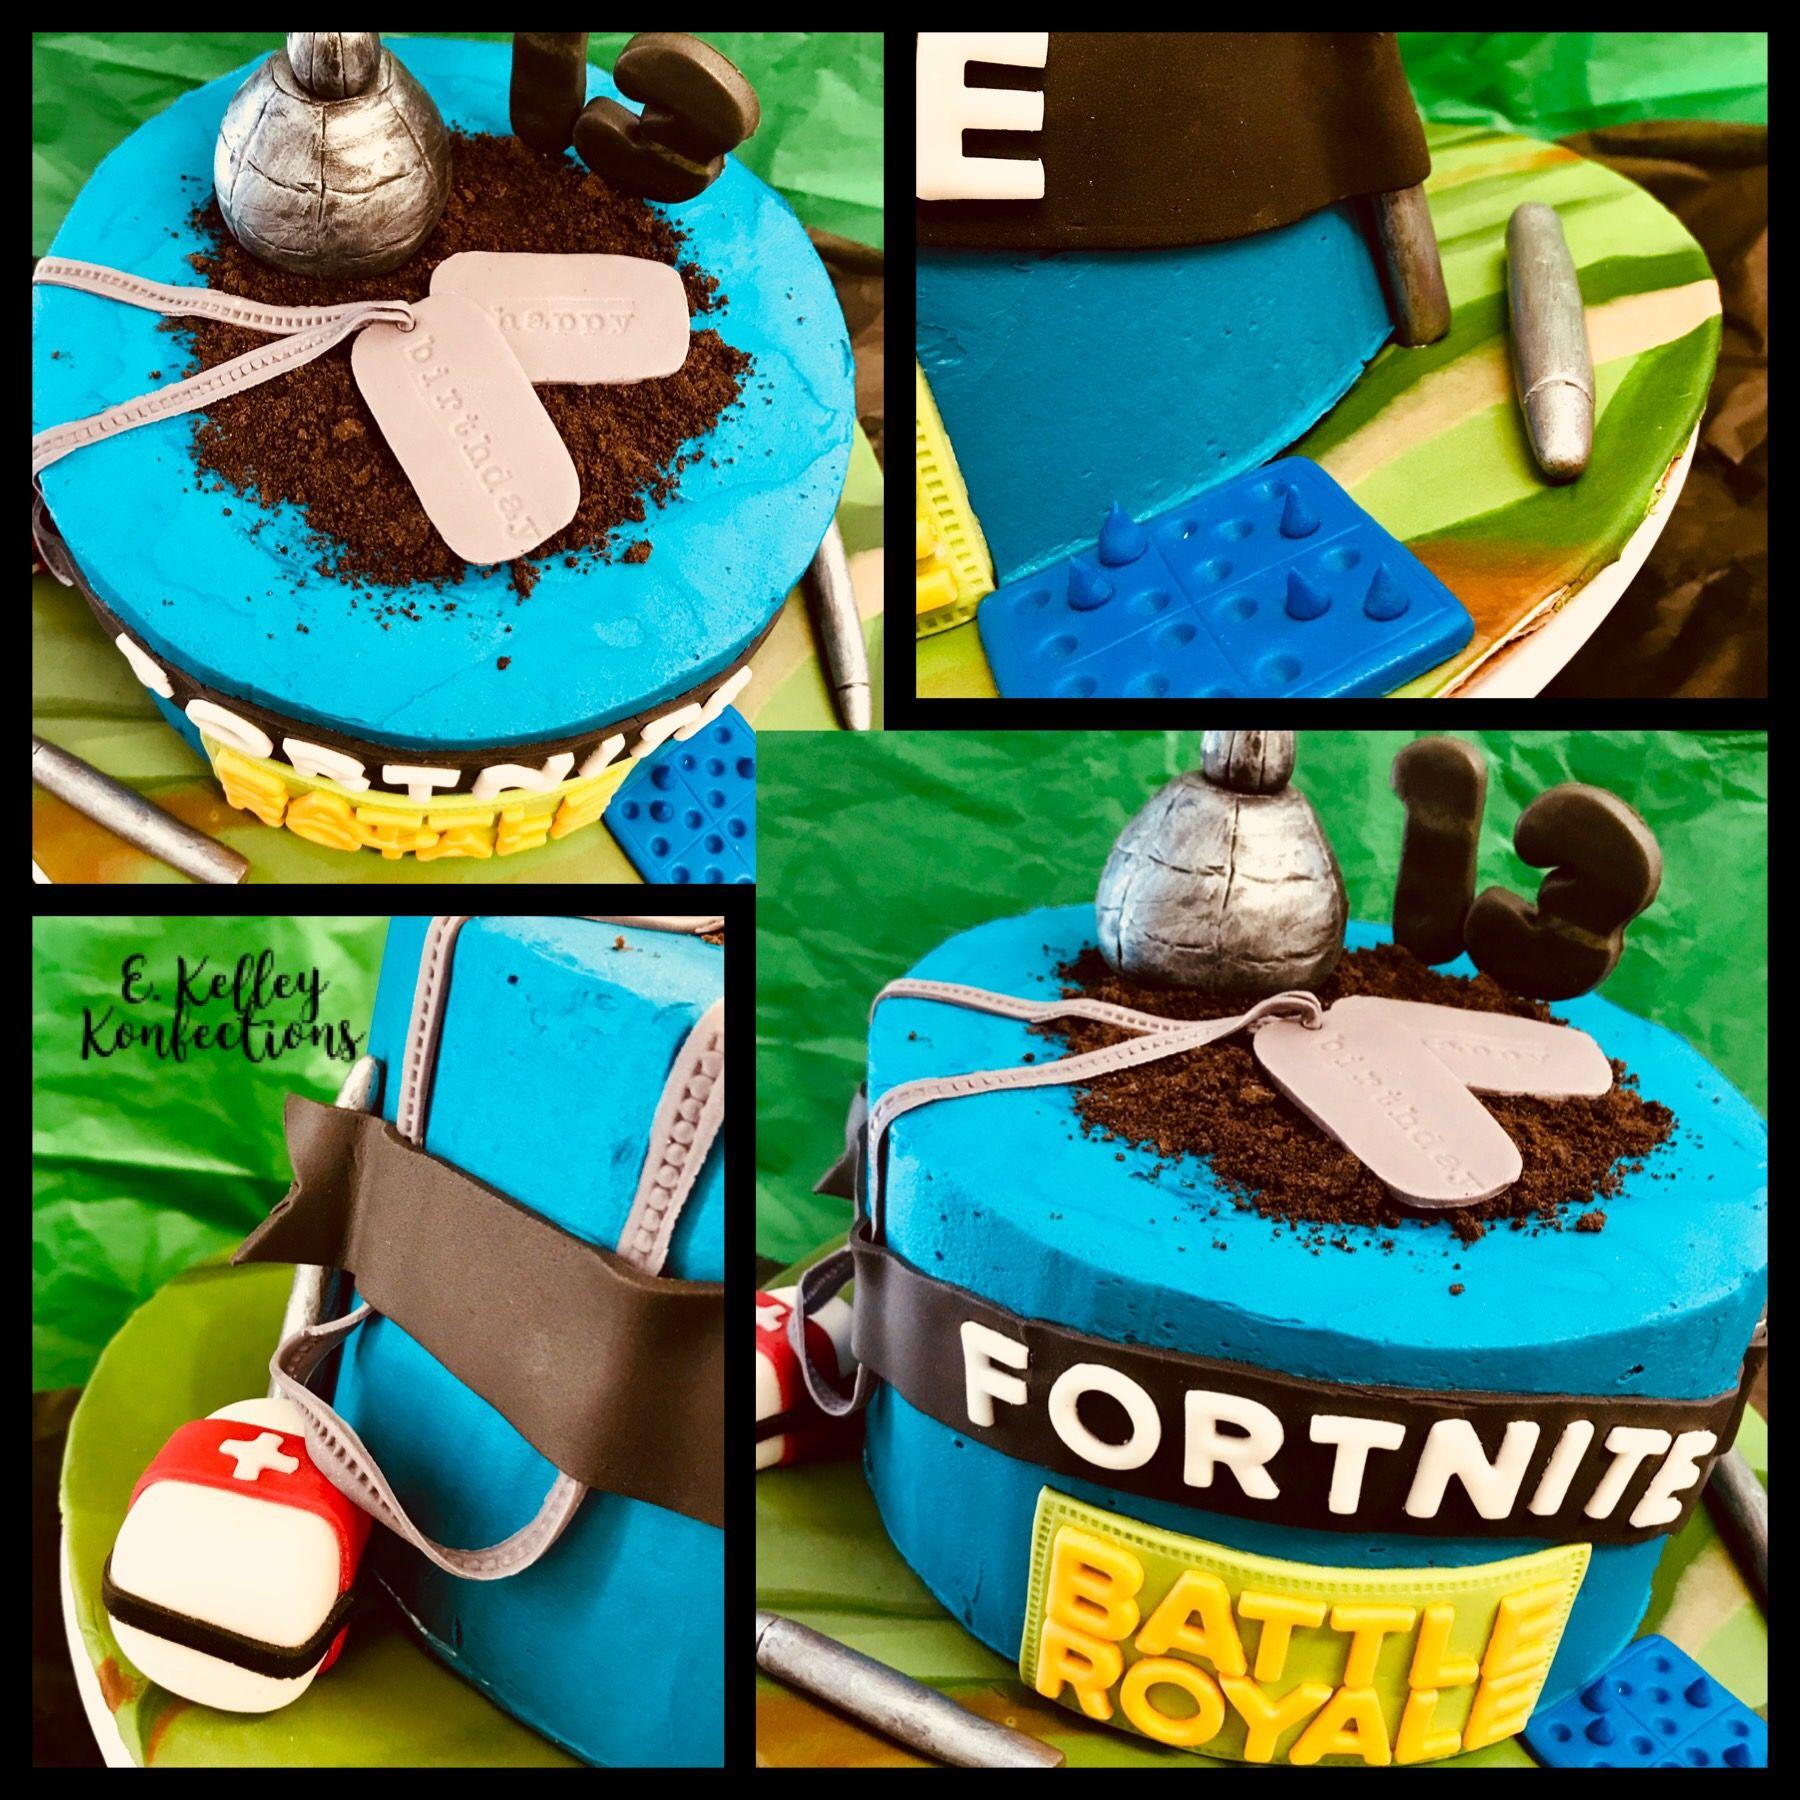 Fortnite cake 13th birthday cake teenager birthday cake